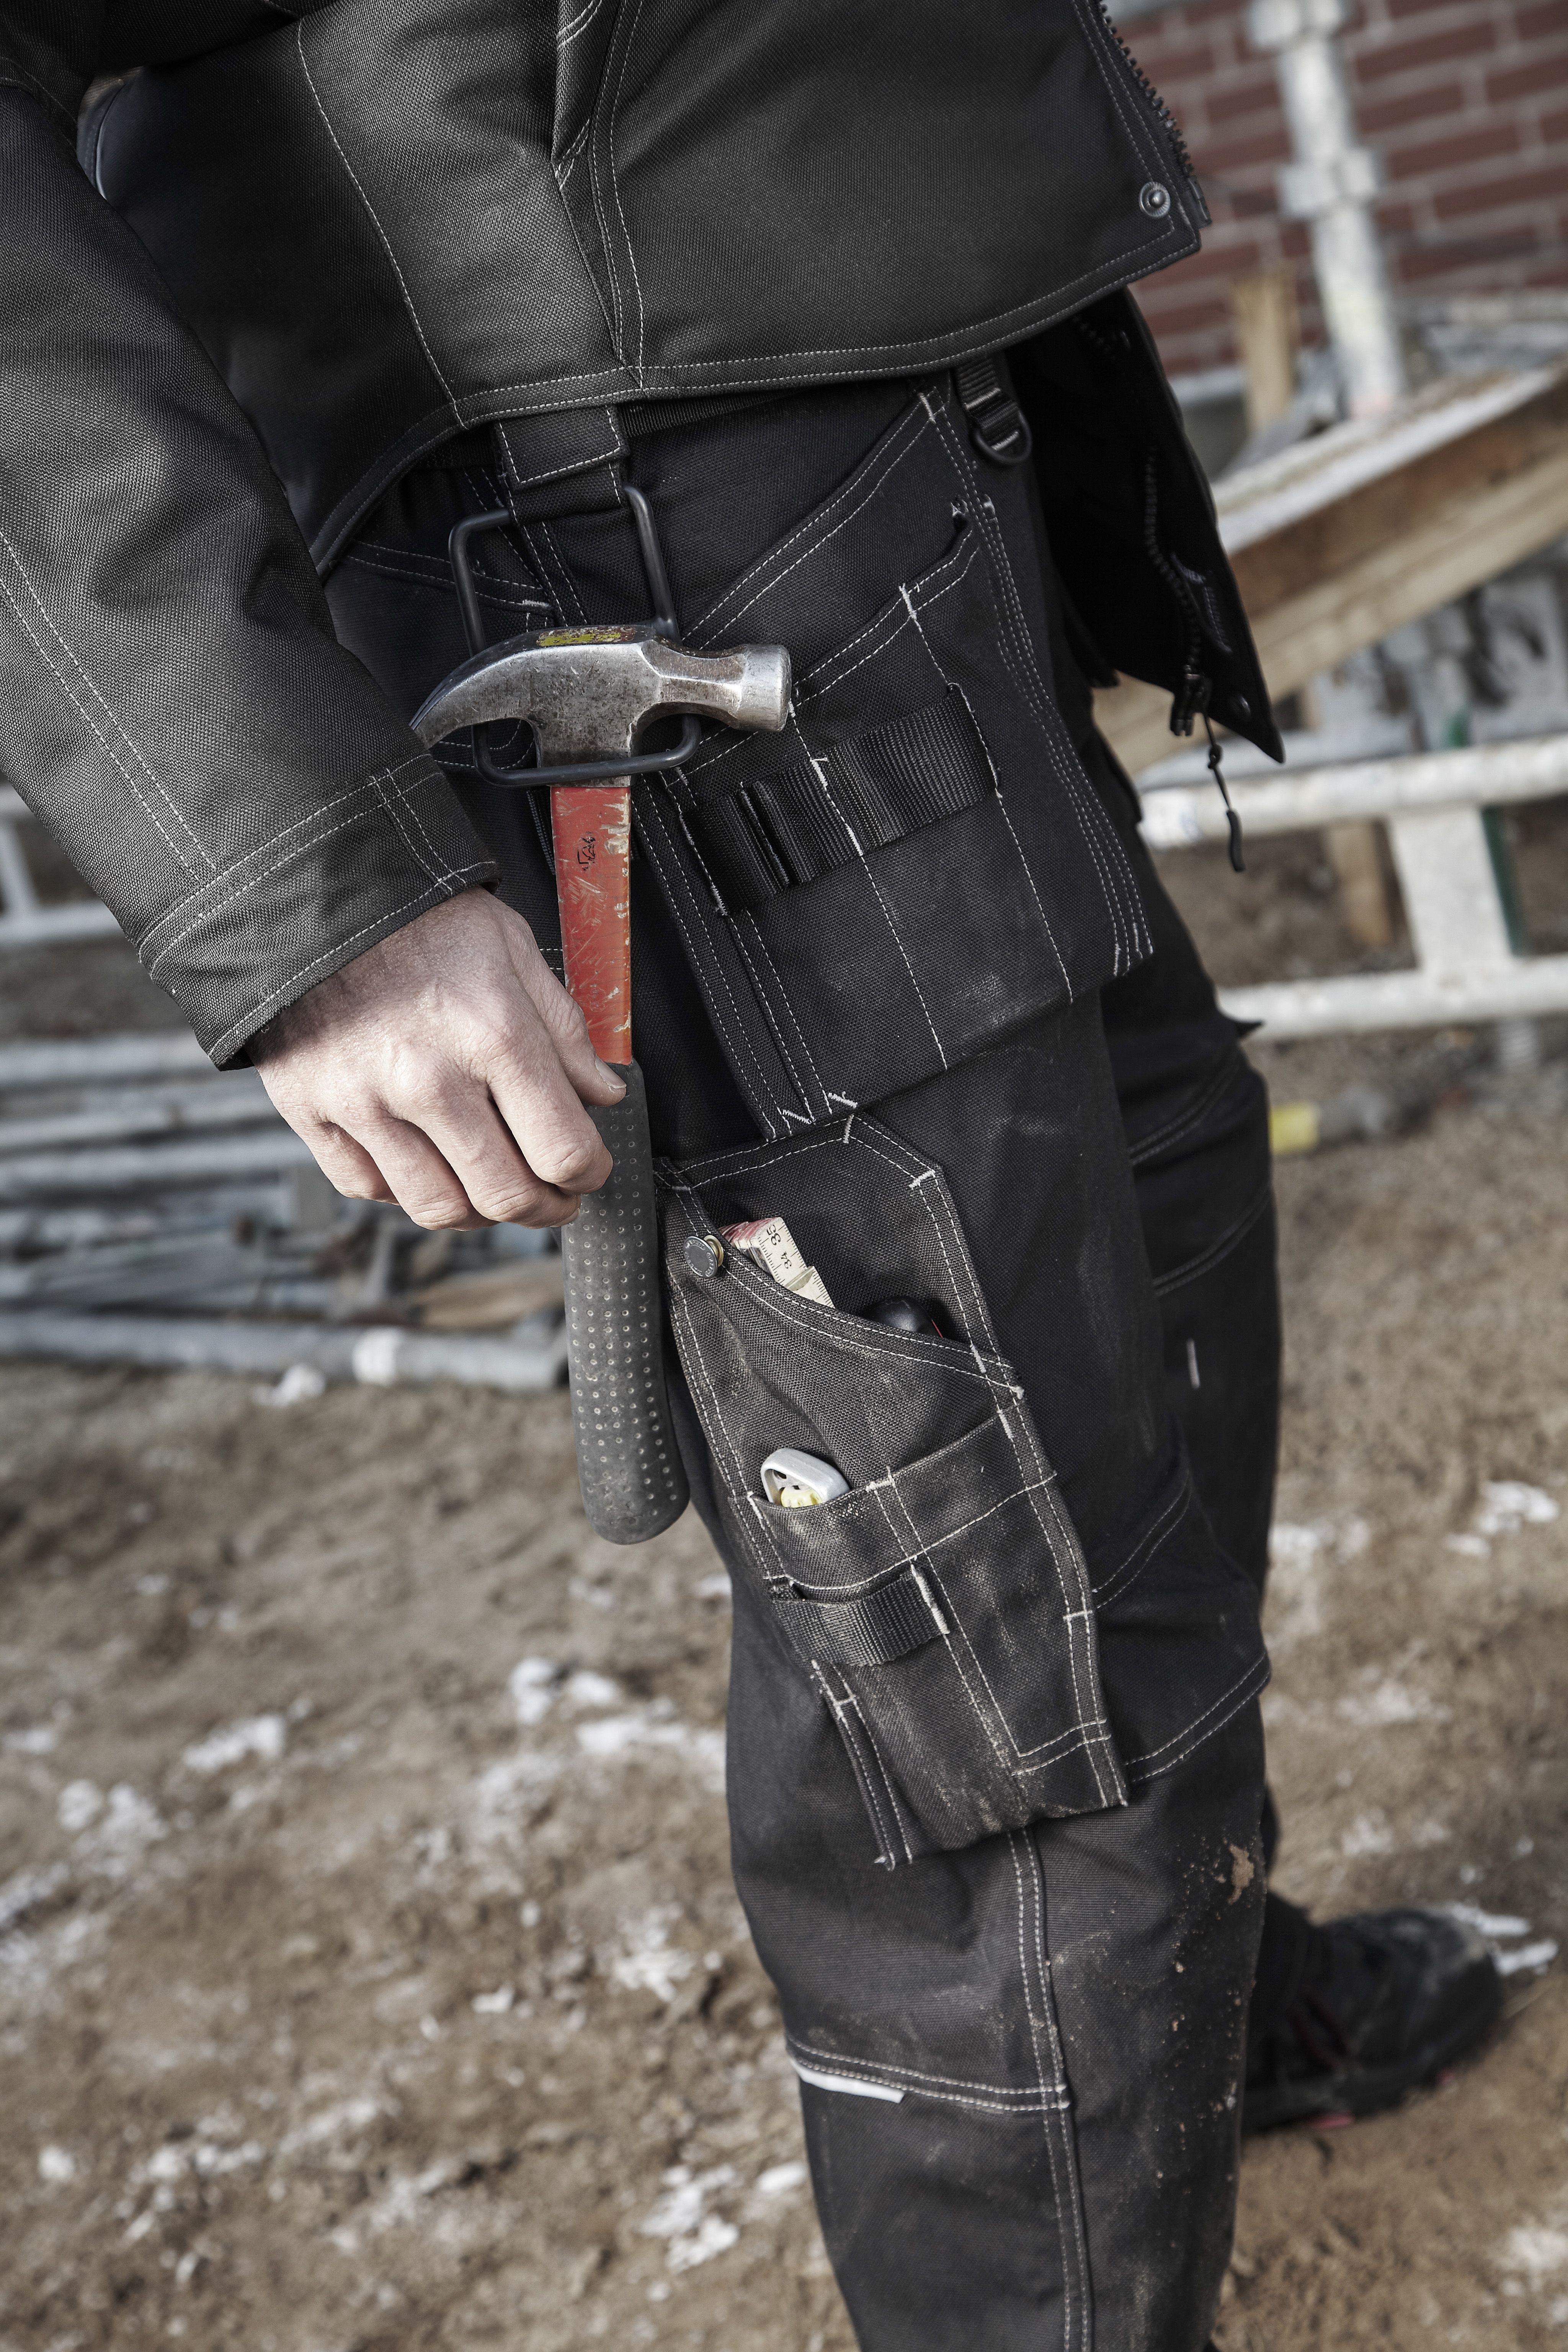 JCB Workwear Trade Plus Rip Stop Men Work Trousers Pants Tool Pockets Black Grey